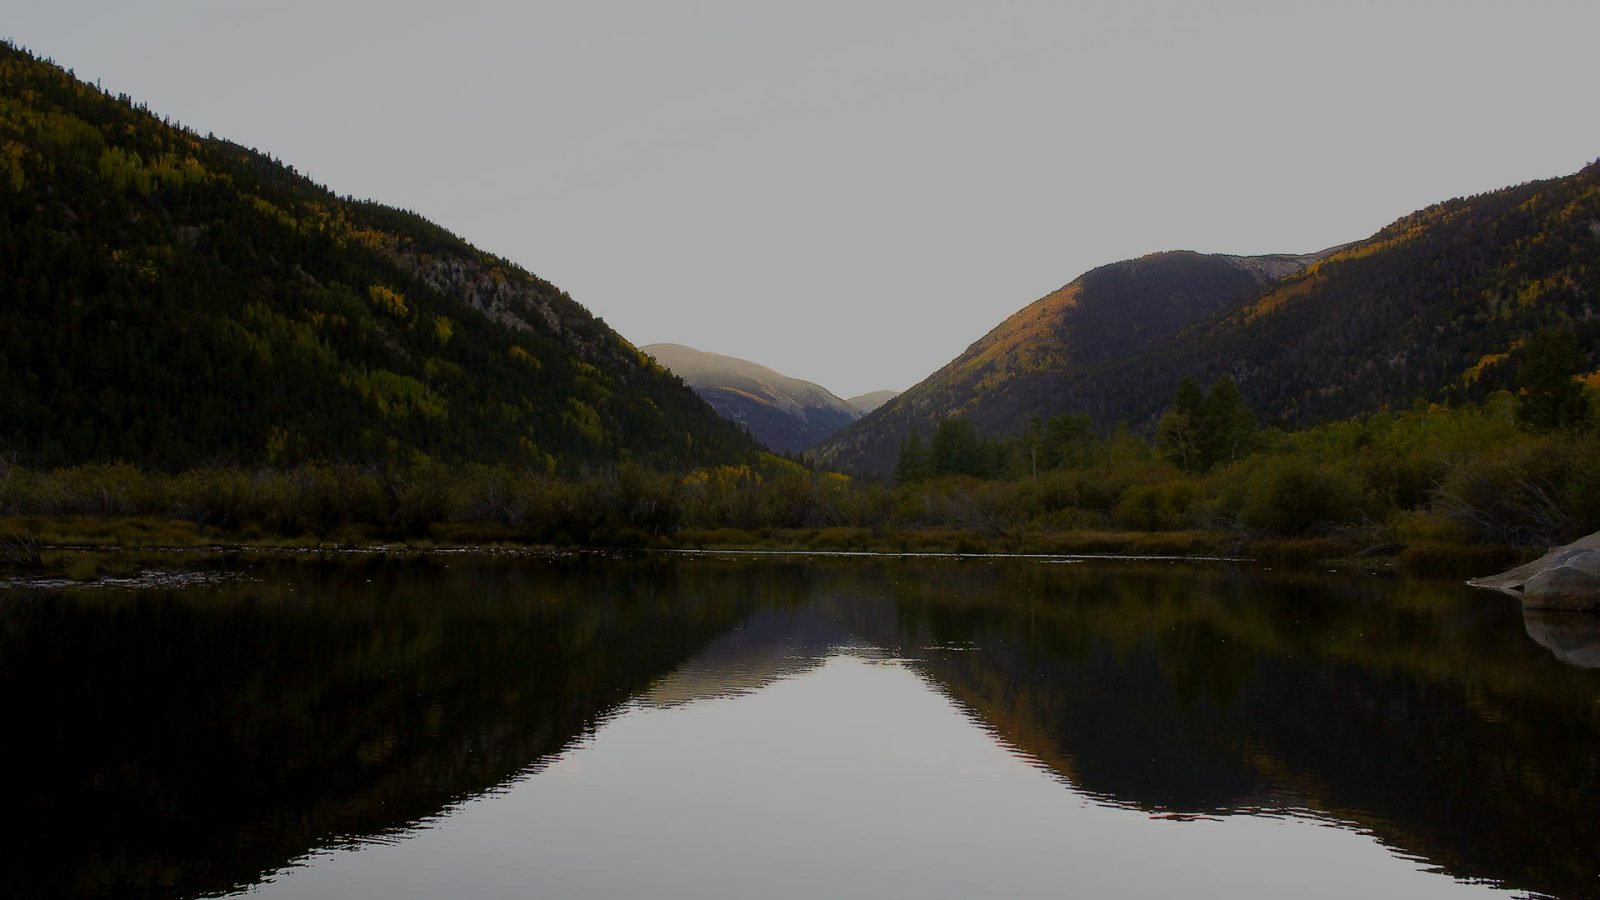 2021 Camp & Soak May Lodging Special